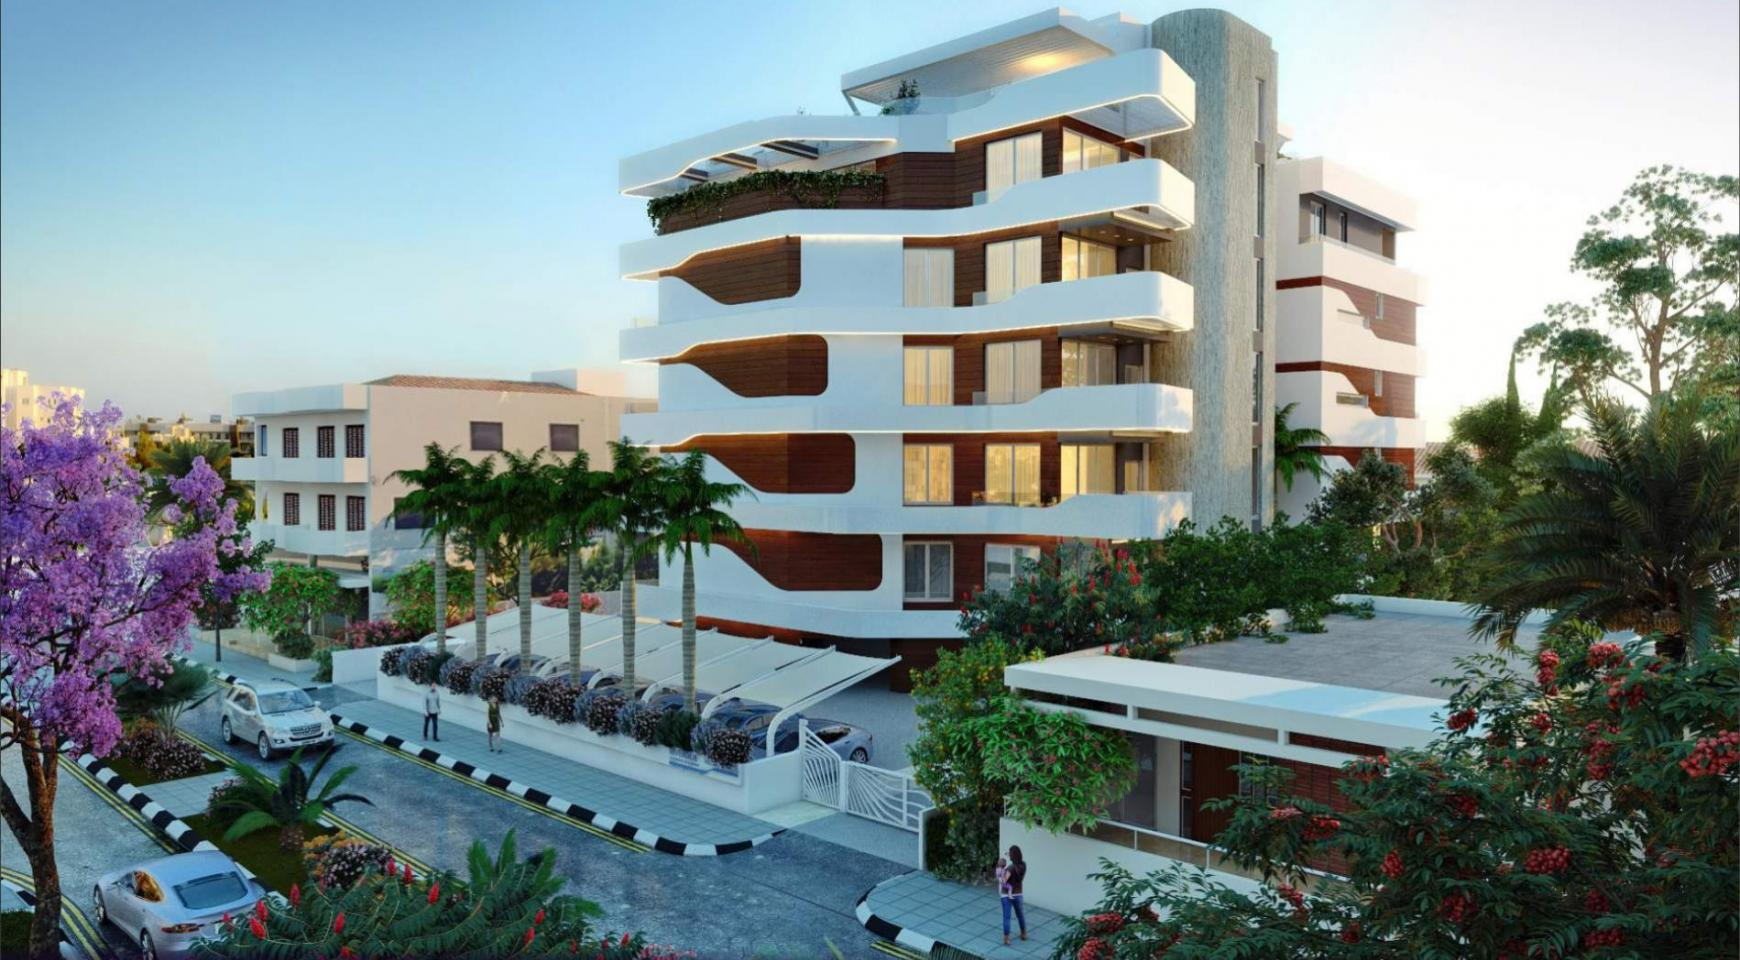 New 3 Bedroom Apartment in a Contemporary Complex near the Sea - 4